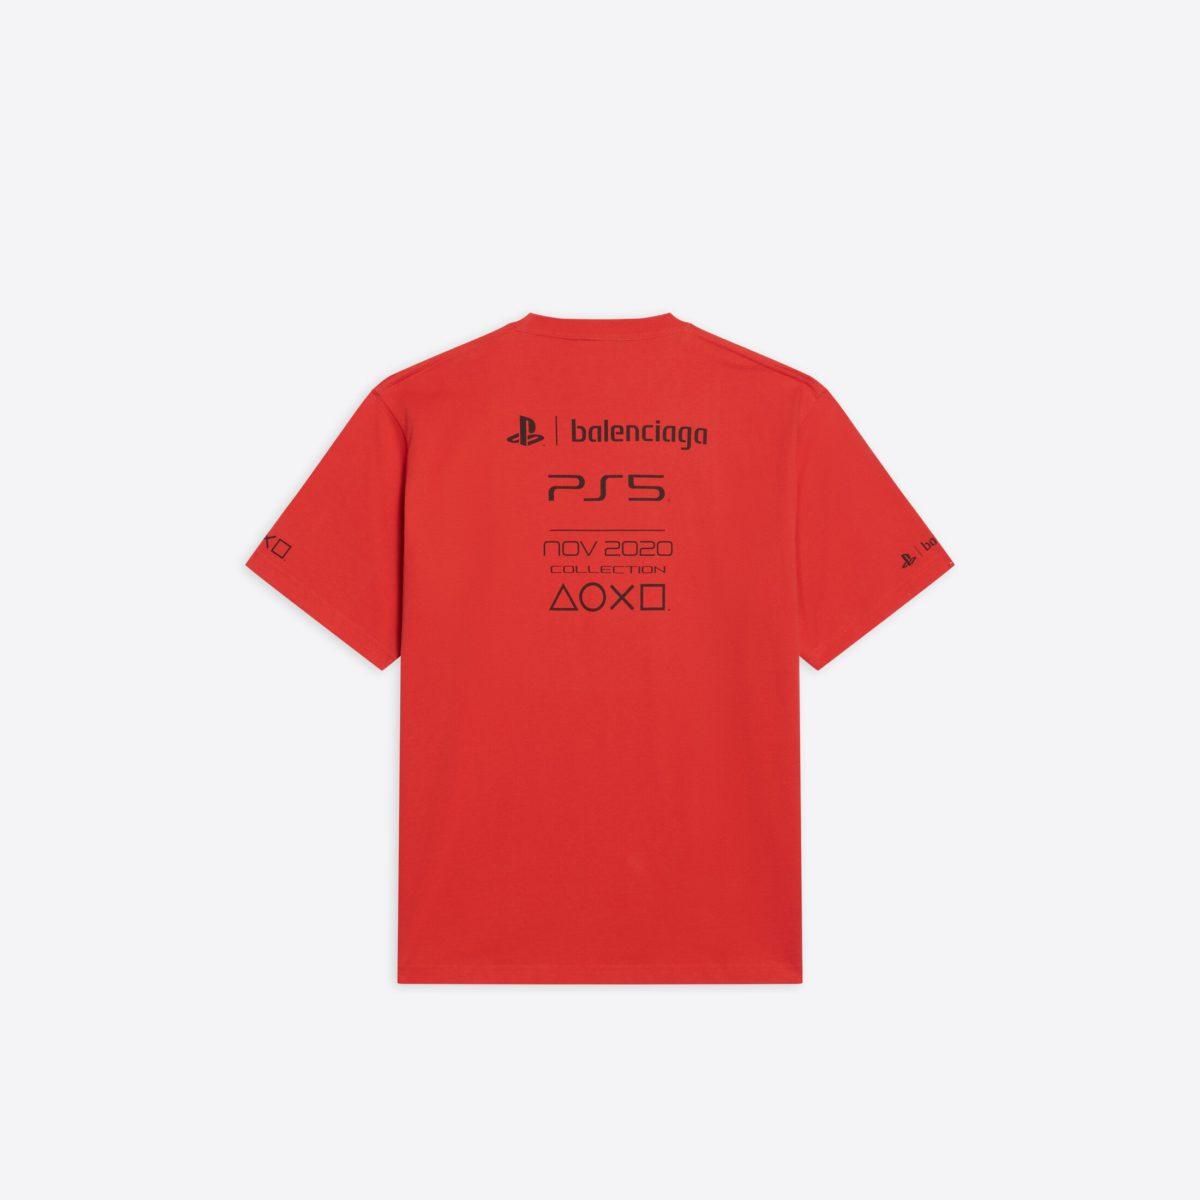 Balenciaga x PS5 T 恤背面